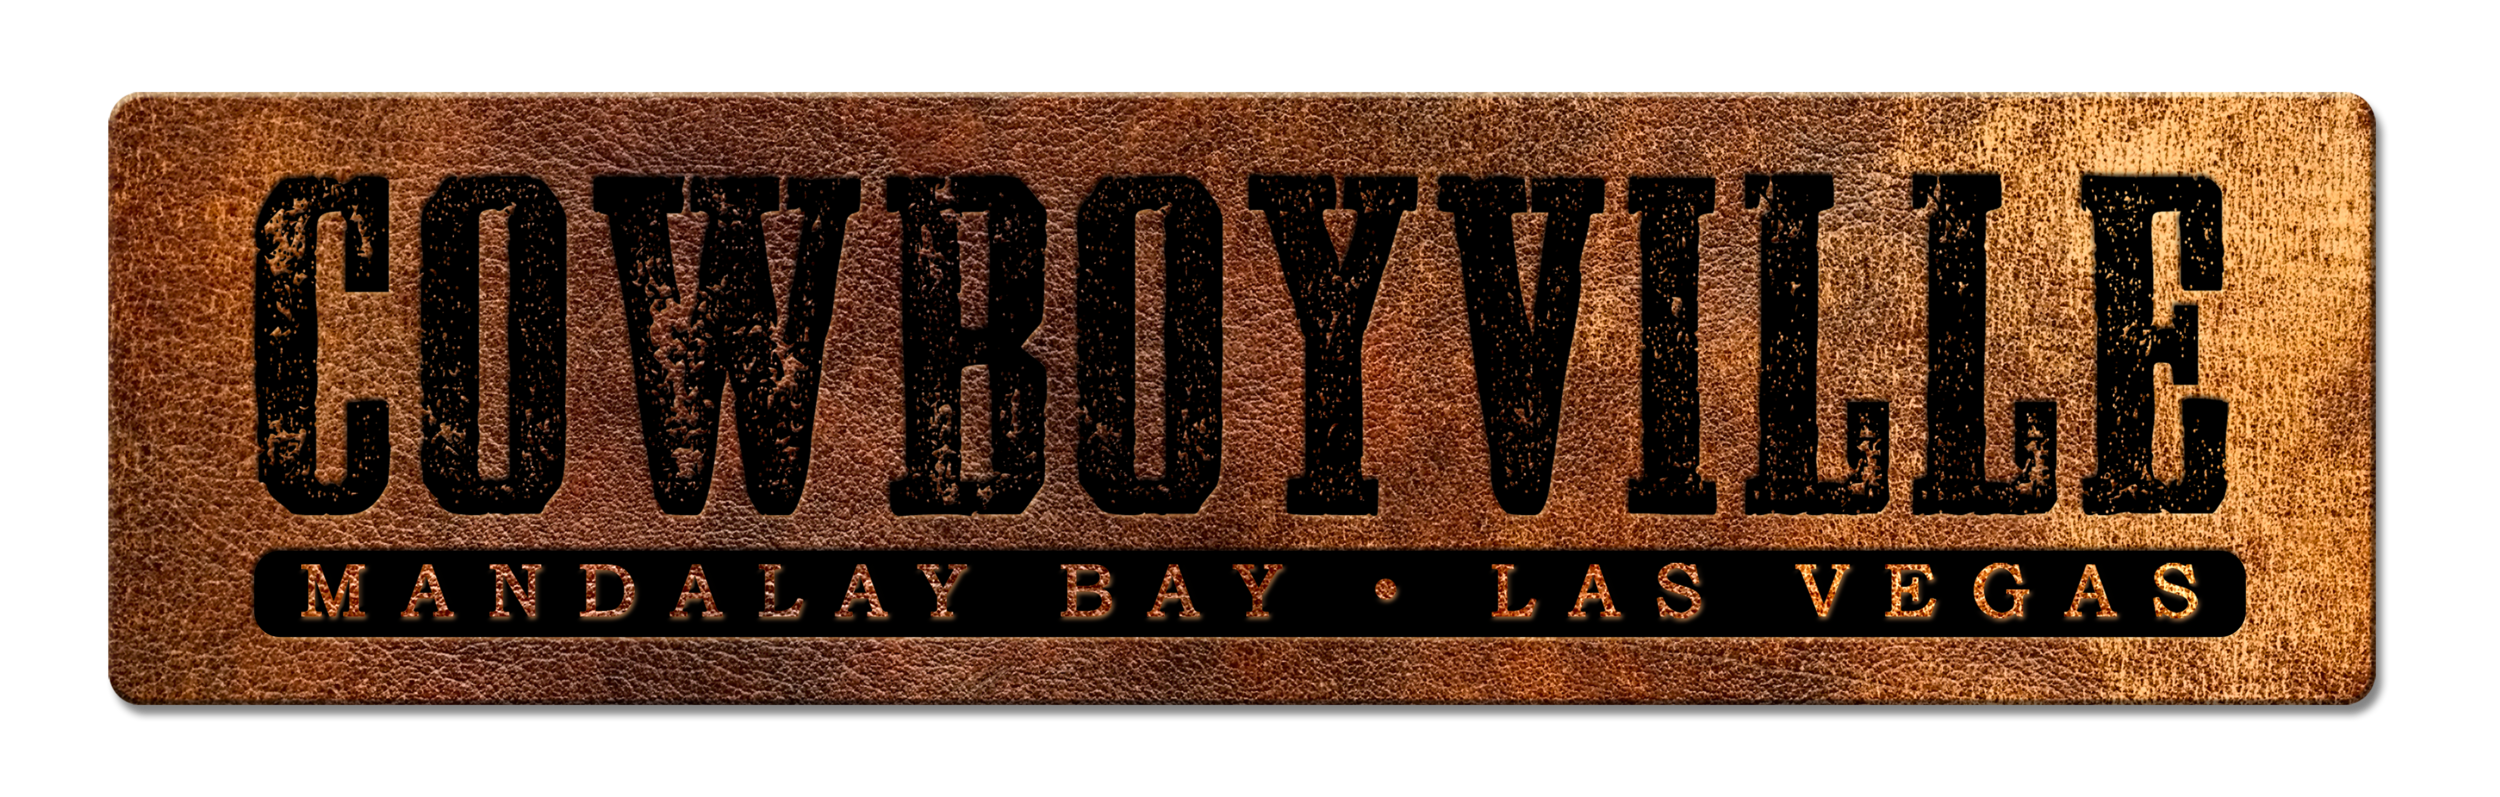 Cowboyville